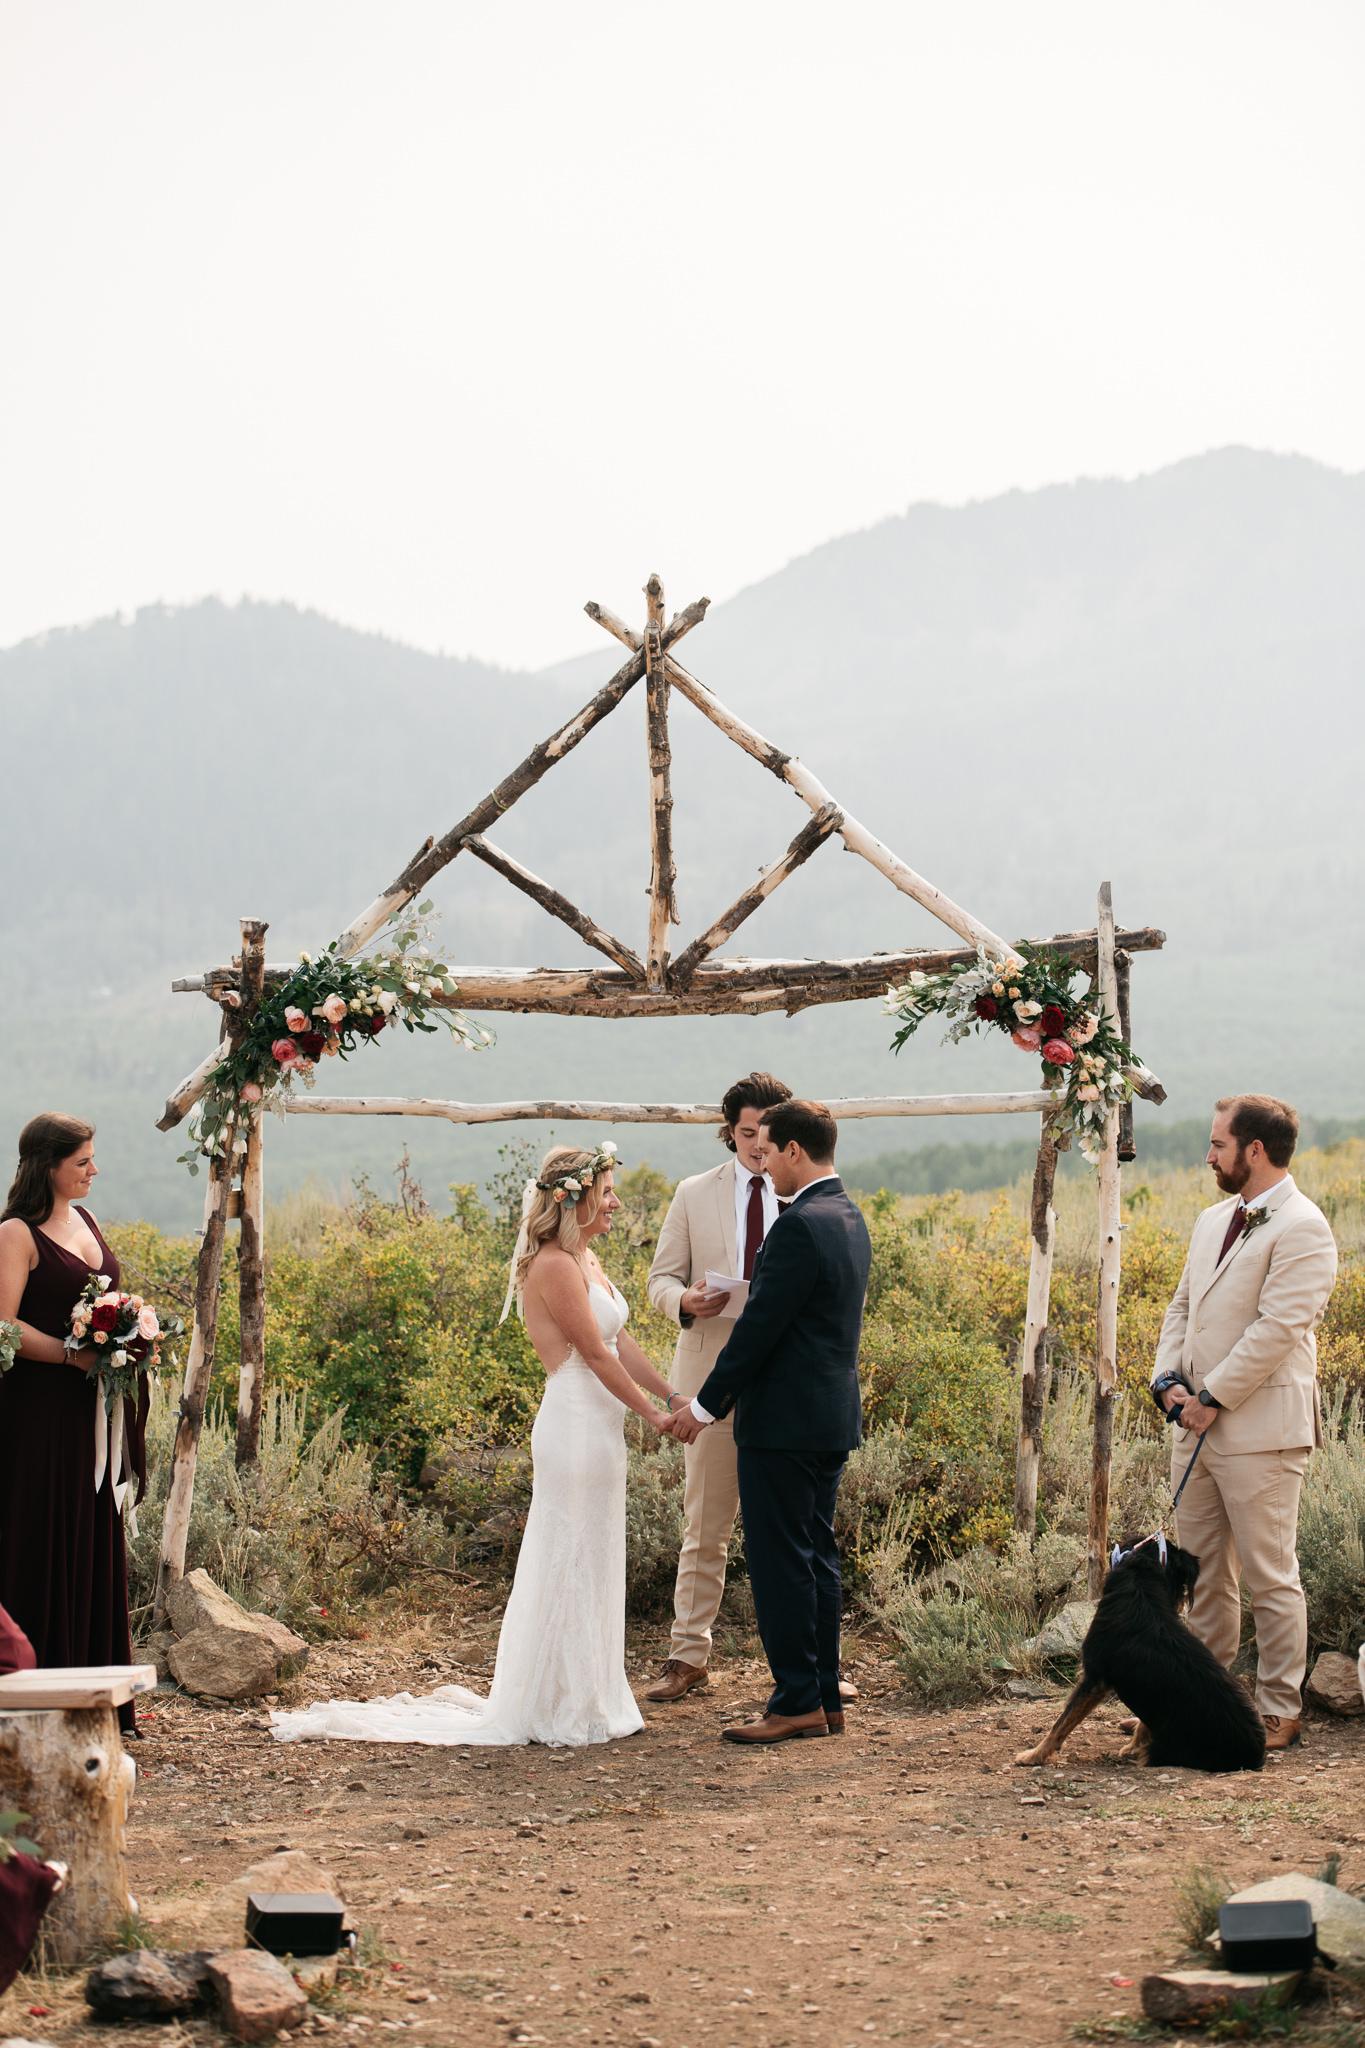 Church of Dirt, Park City Wedding photographed by wedding photographer Trevor Hooper Photo